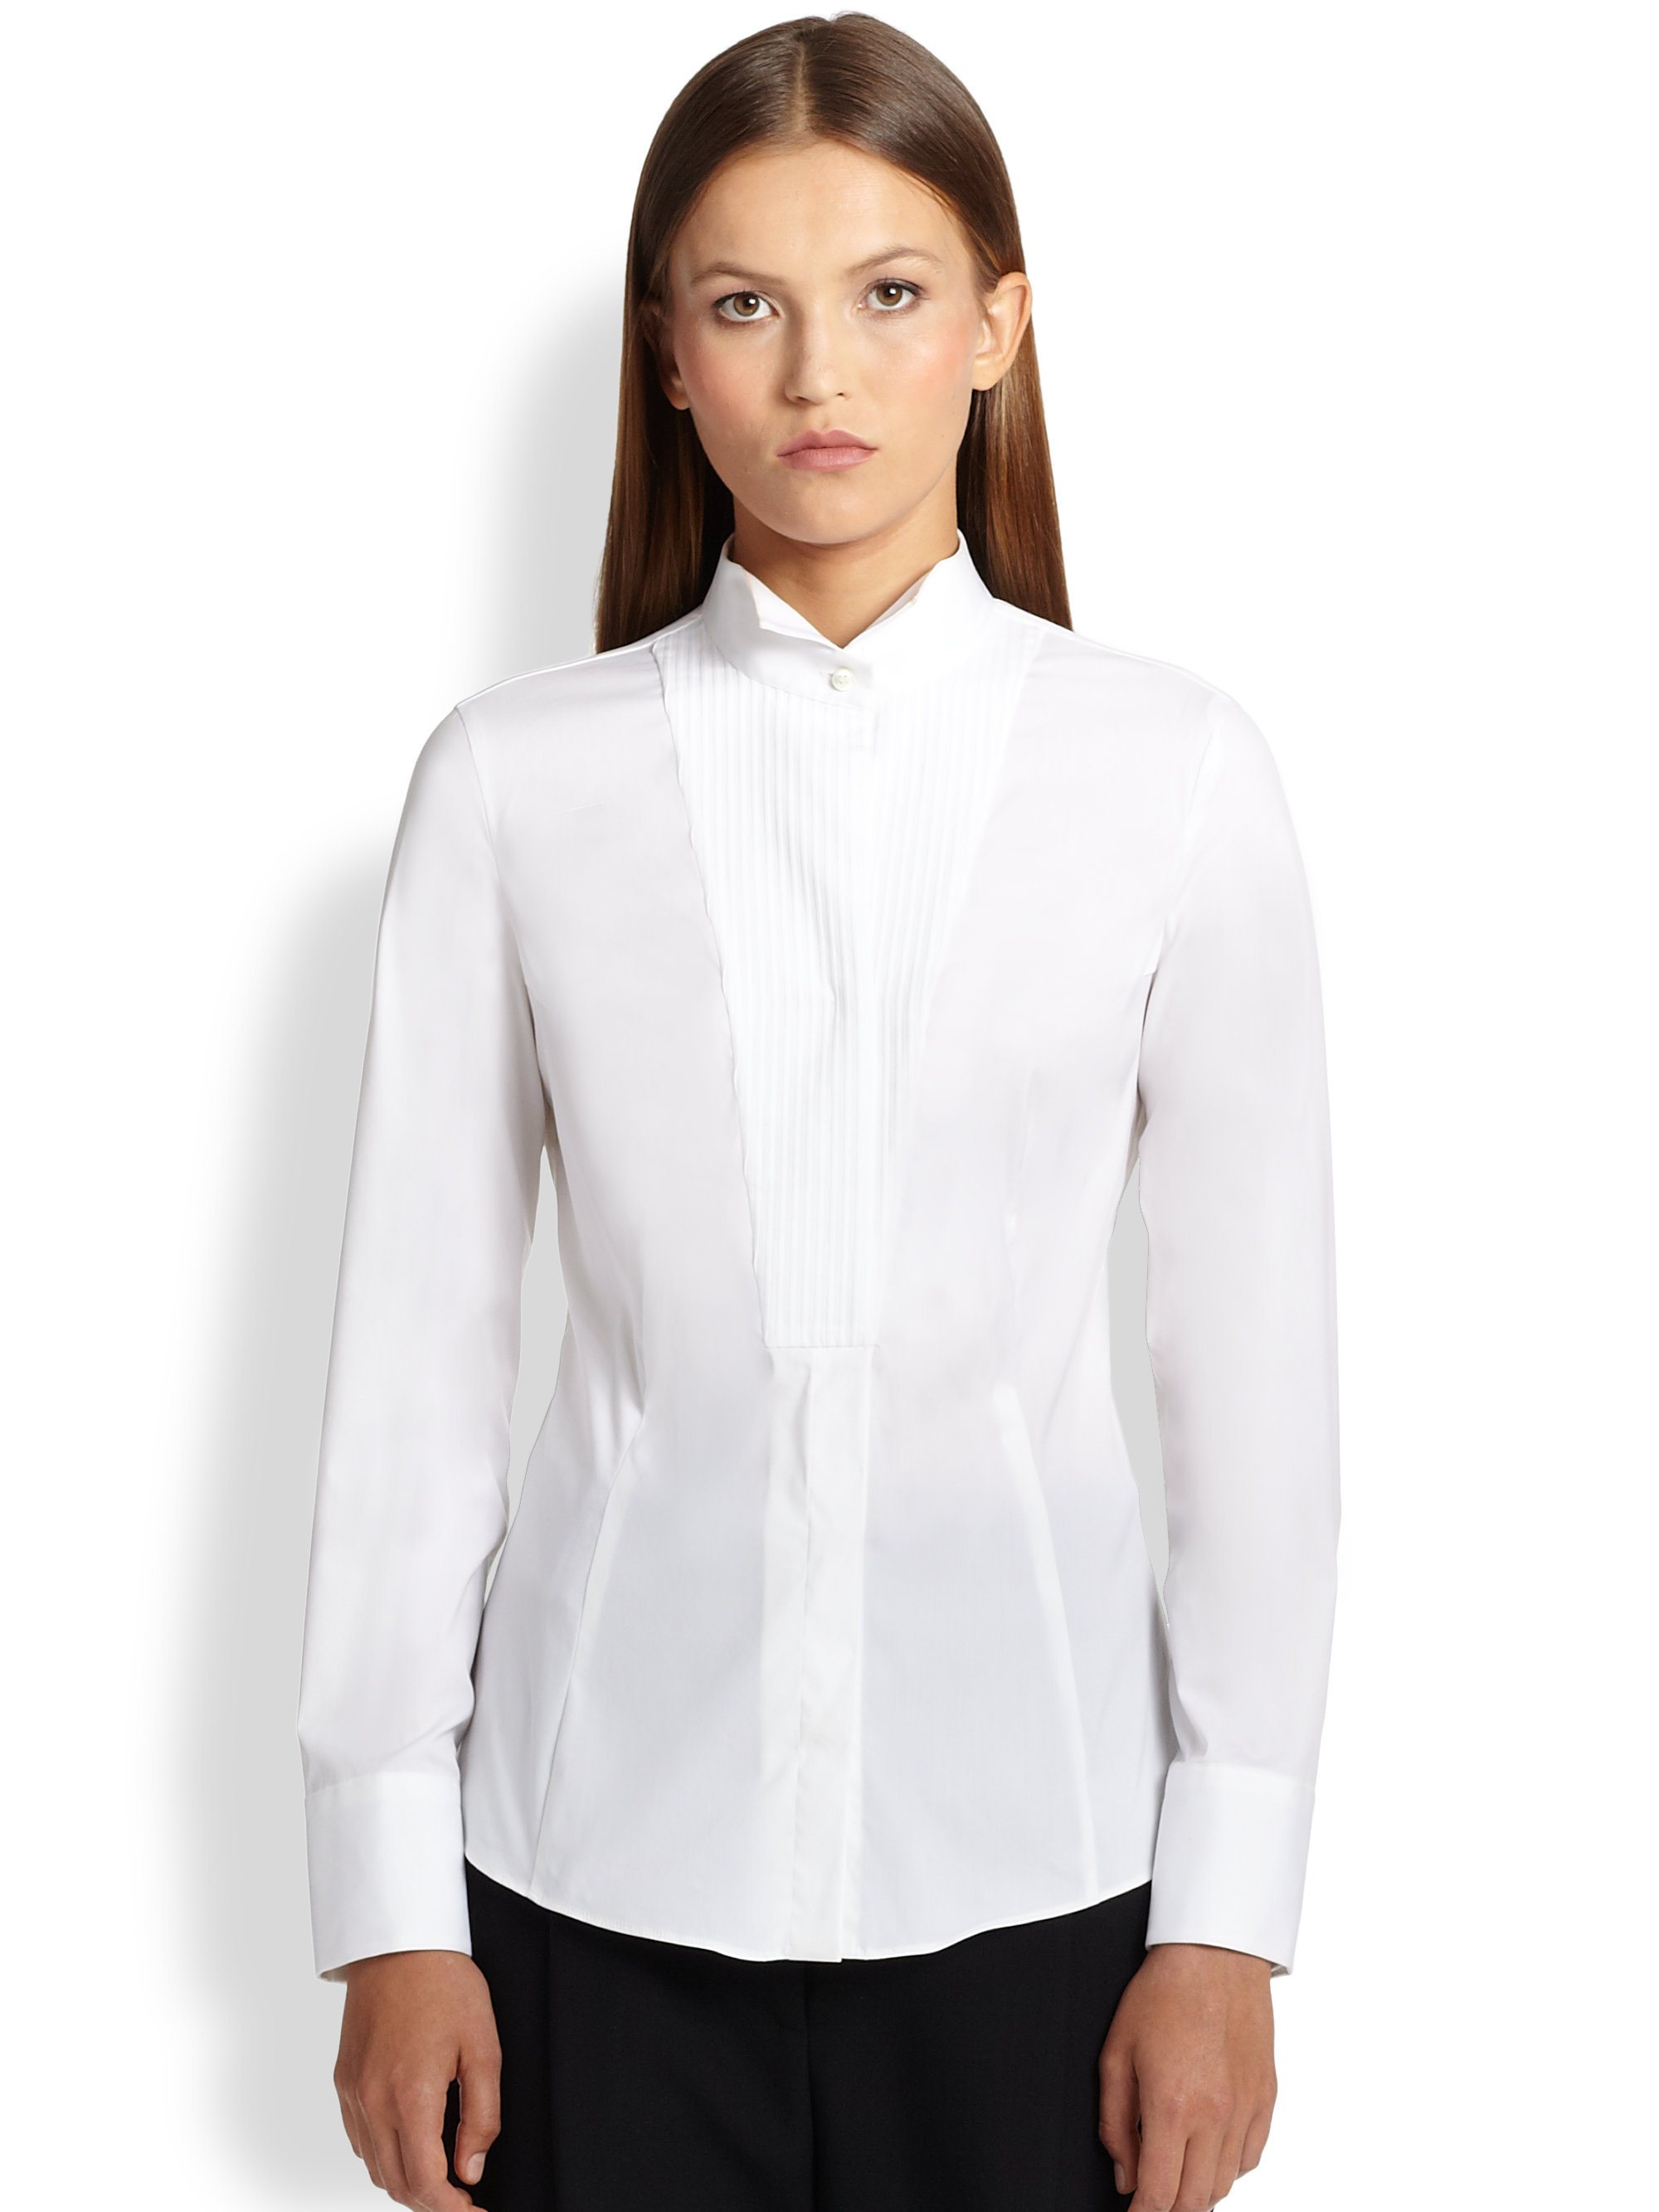 Images of Womens Tuxedo Shirt White